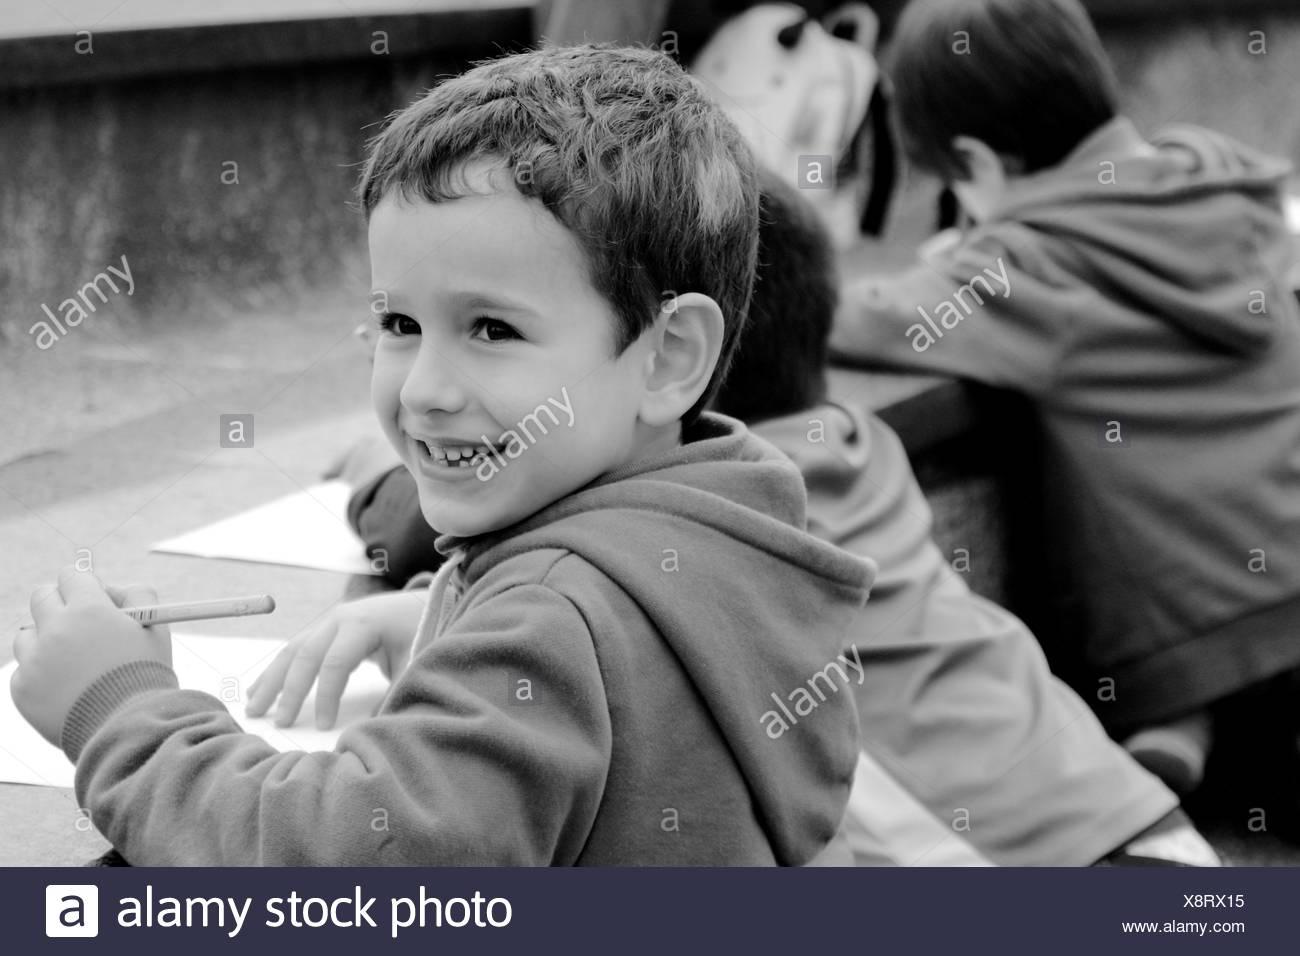 China, la Isla de Hong Kong, Hong Kong, Boy (4-5) sonriente mientras dibujo, gente en segundo plano. Imagen De Stock